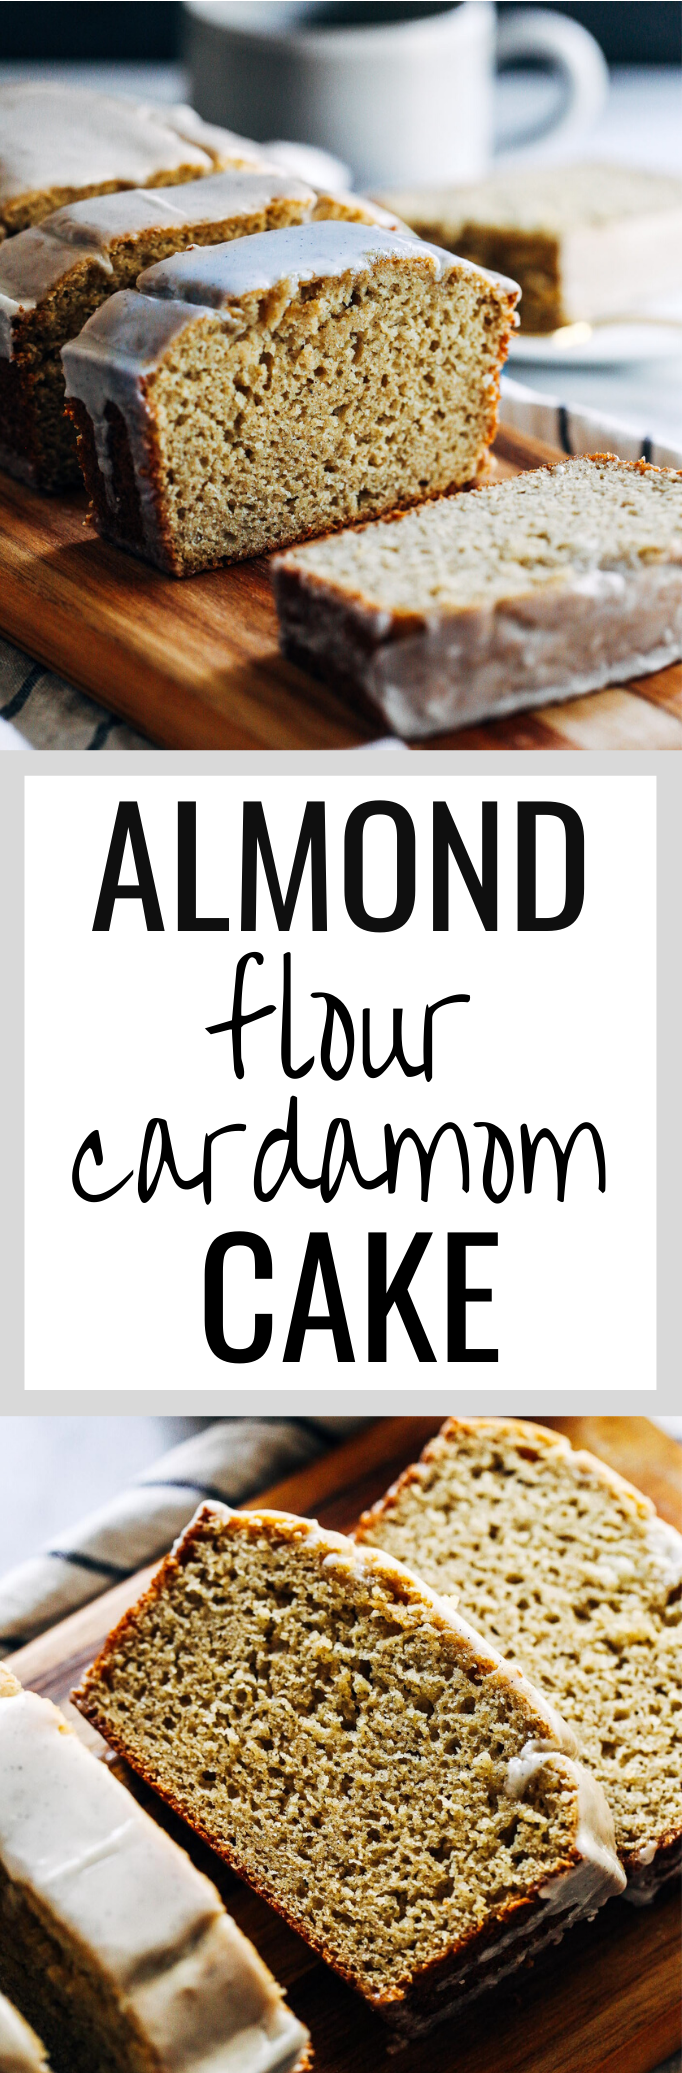 Almond Flour Cardamom Cake with Vanilla Bean Icing